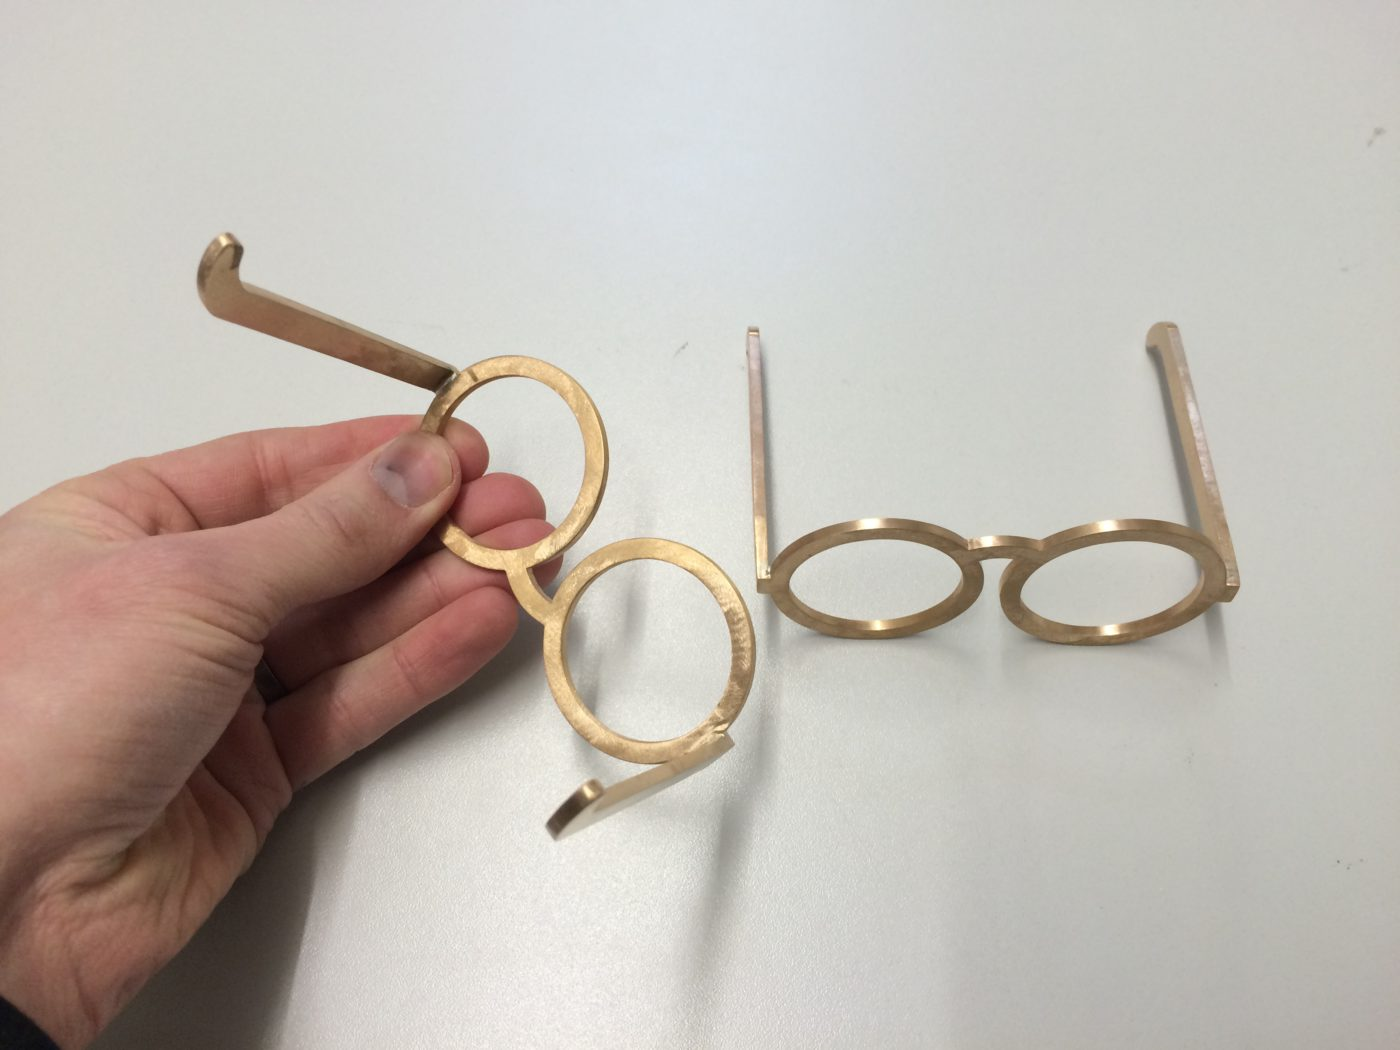 Formando portfolio - ontwerp en 3D print van bril in brons